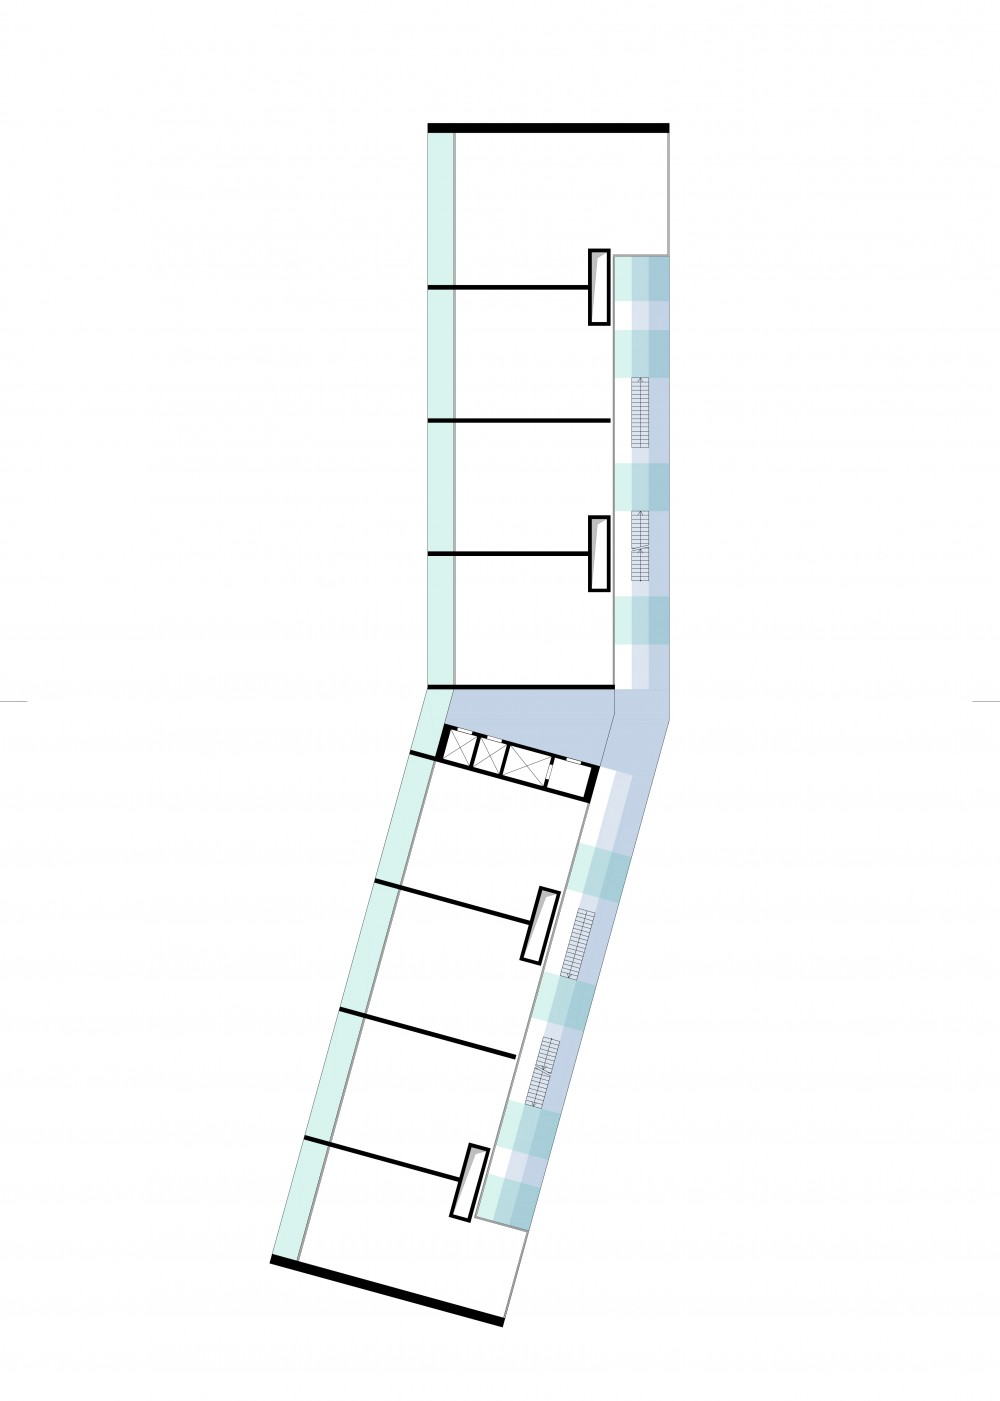 Abscis Architecten - schema privaat - publiek